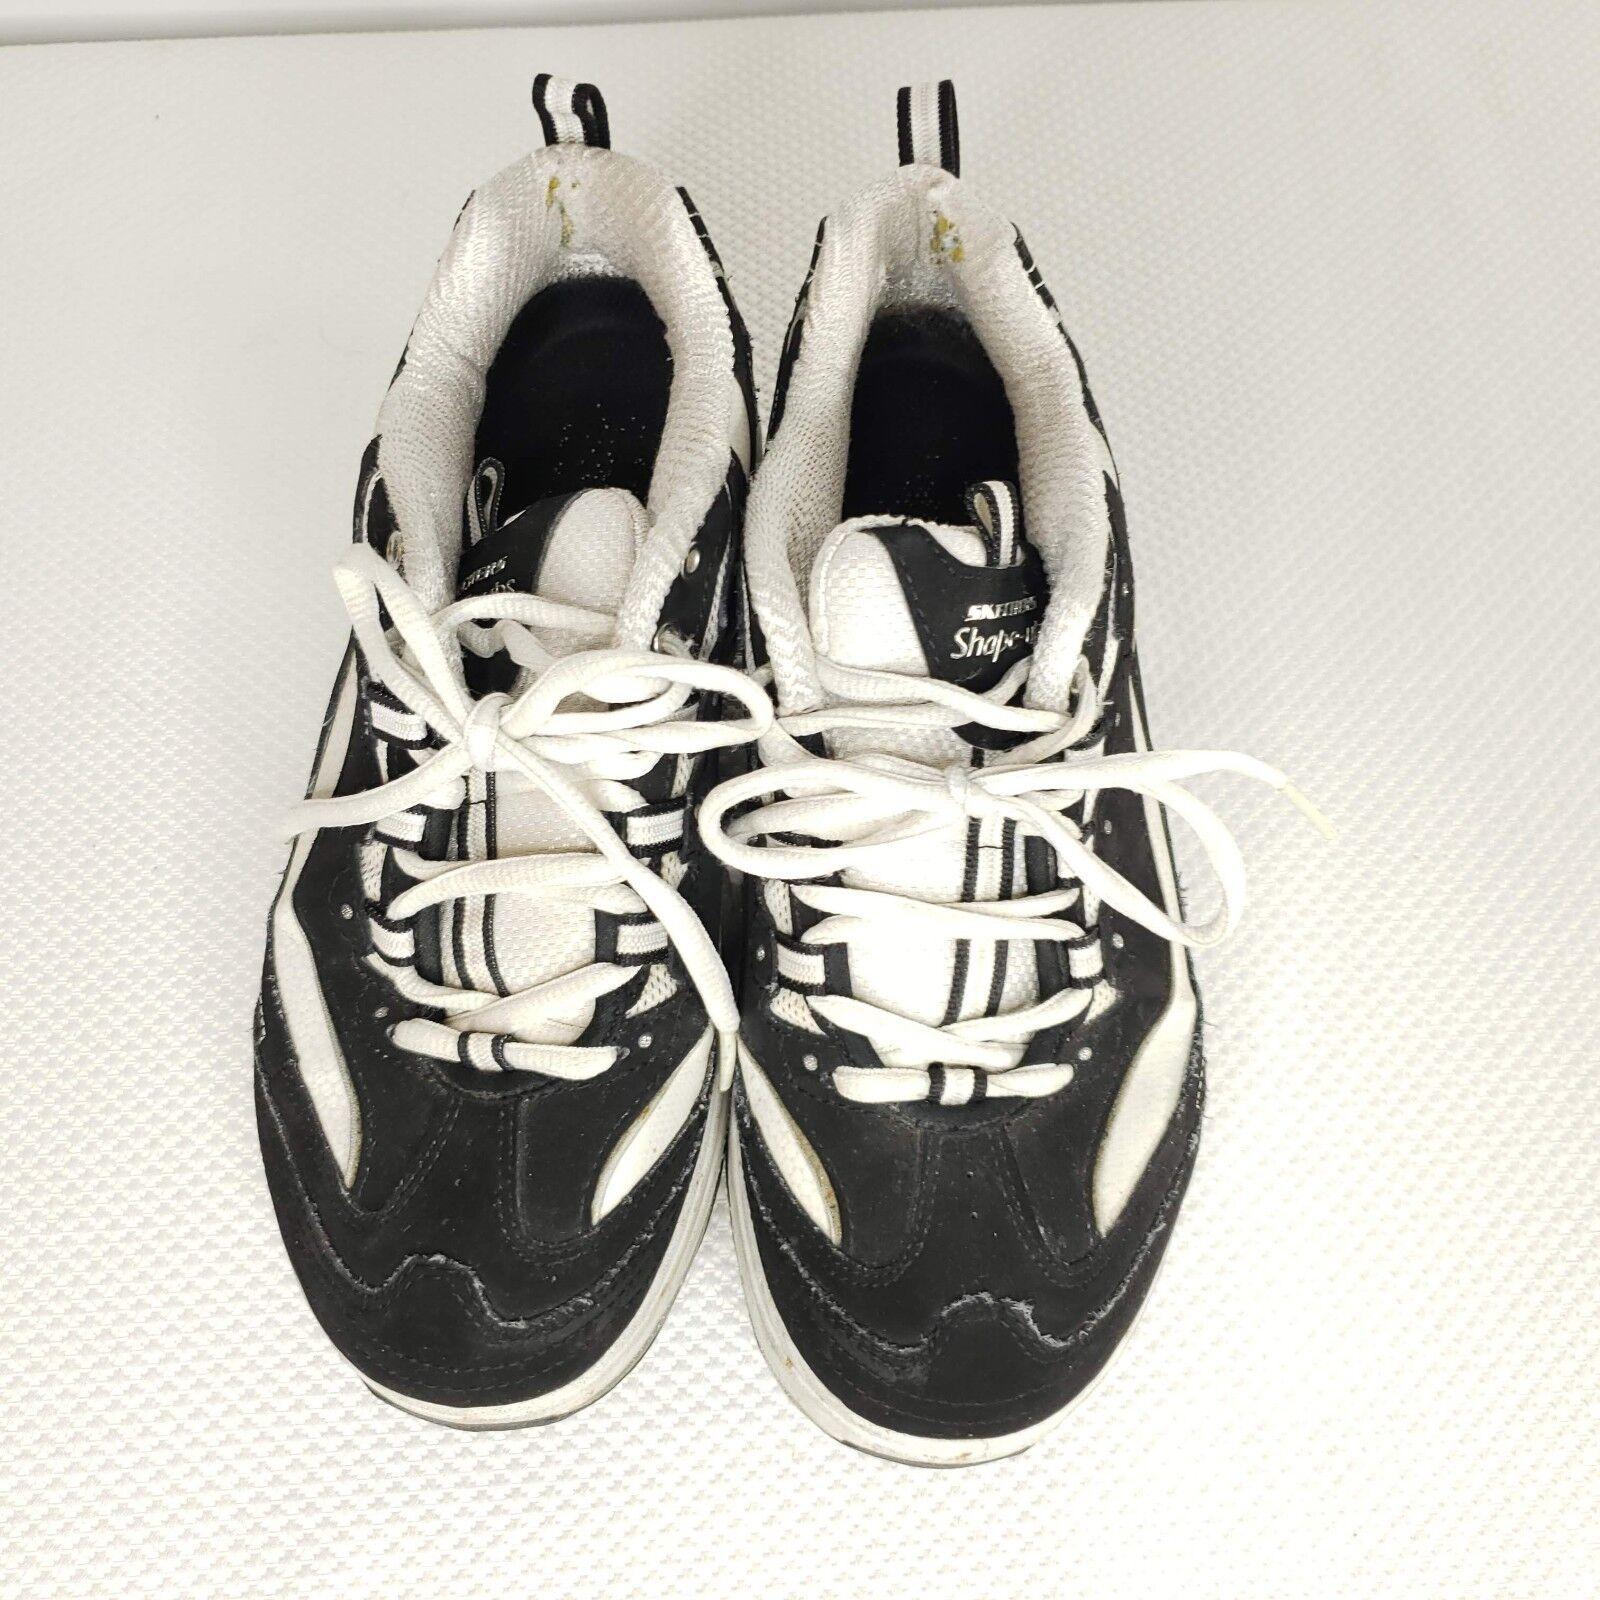 Sketchers Shape Ups 8.5 Black Black Black White Leather Walking Toning Sneakers shoes 44d989